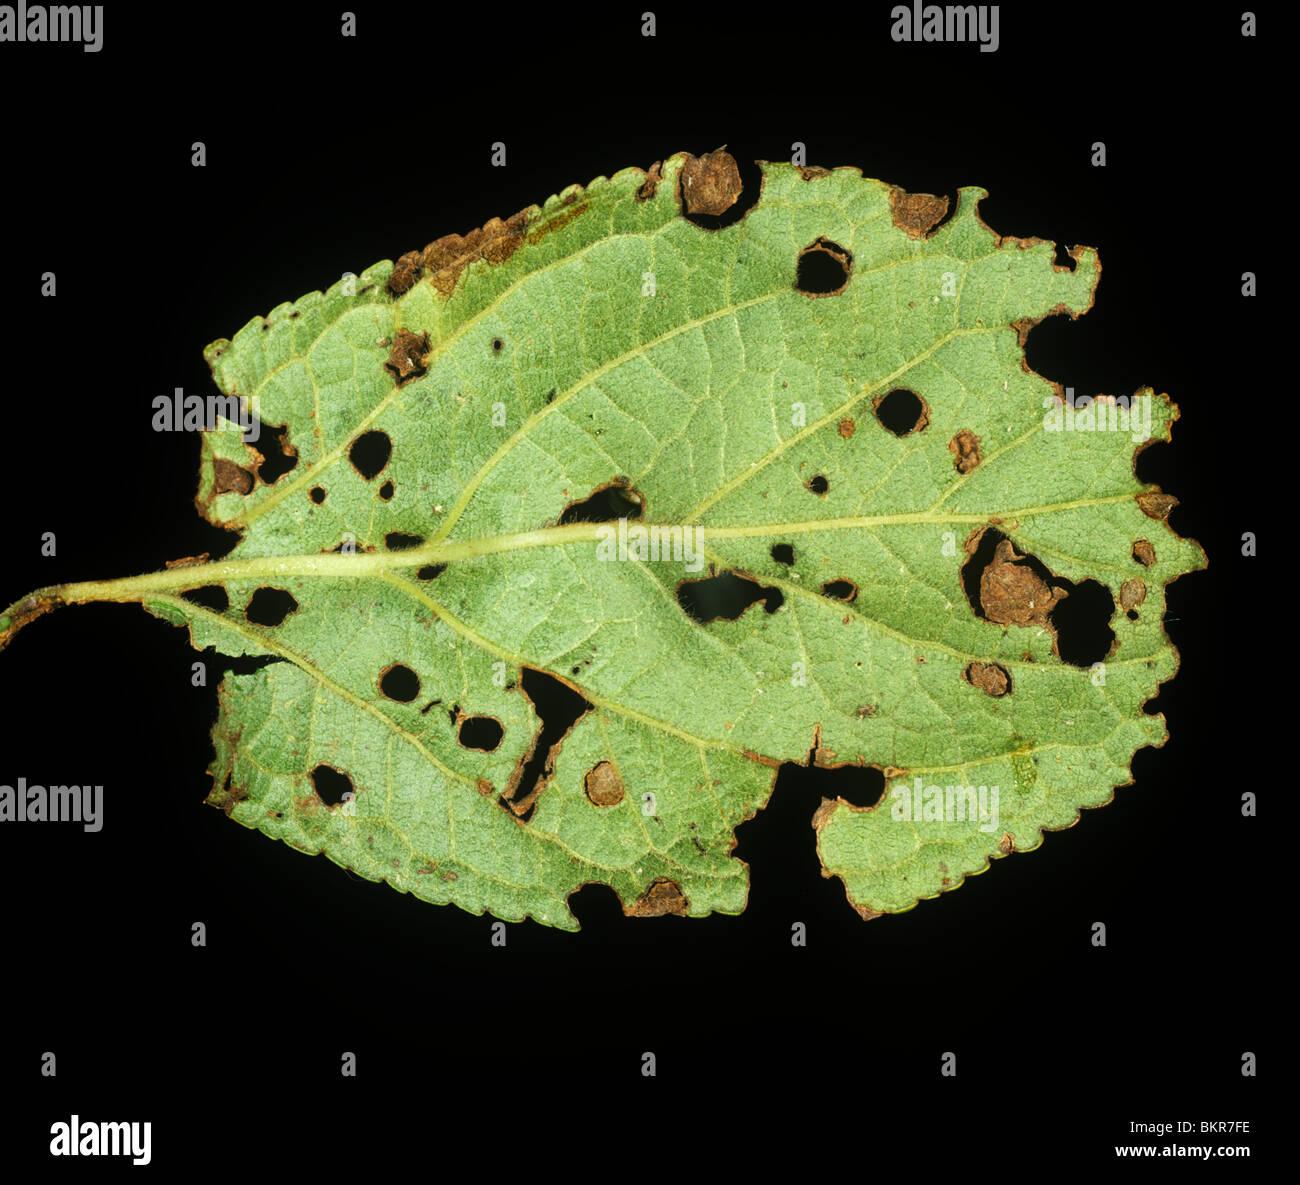 Schuss-Loch Krankheit (Pseudomonas Syringae) Läsionen auf einem Blatt Pflaume Stockbild